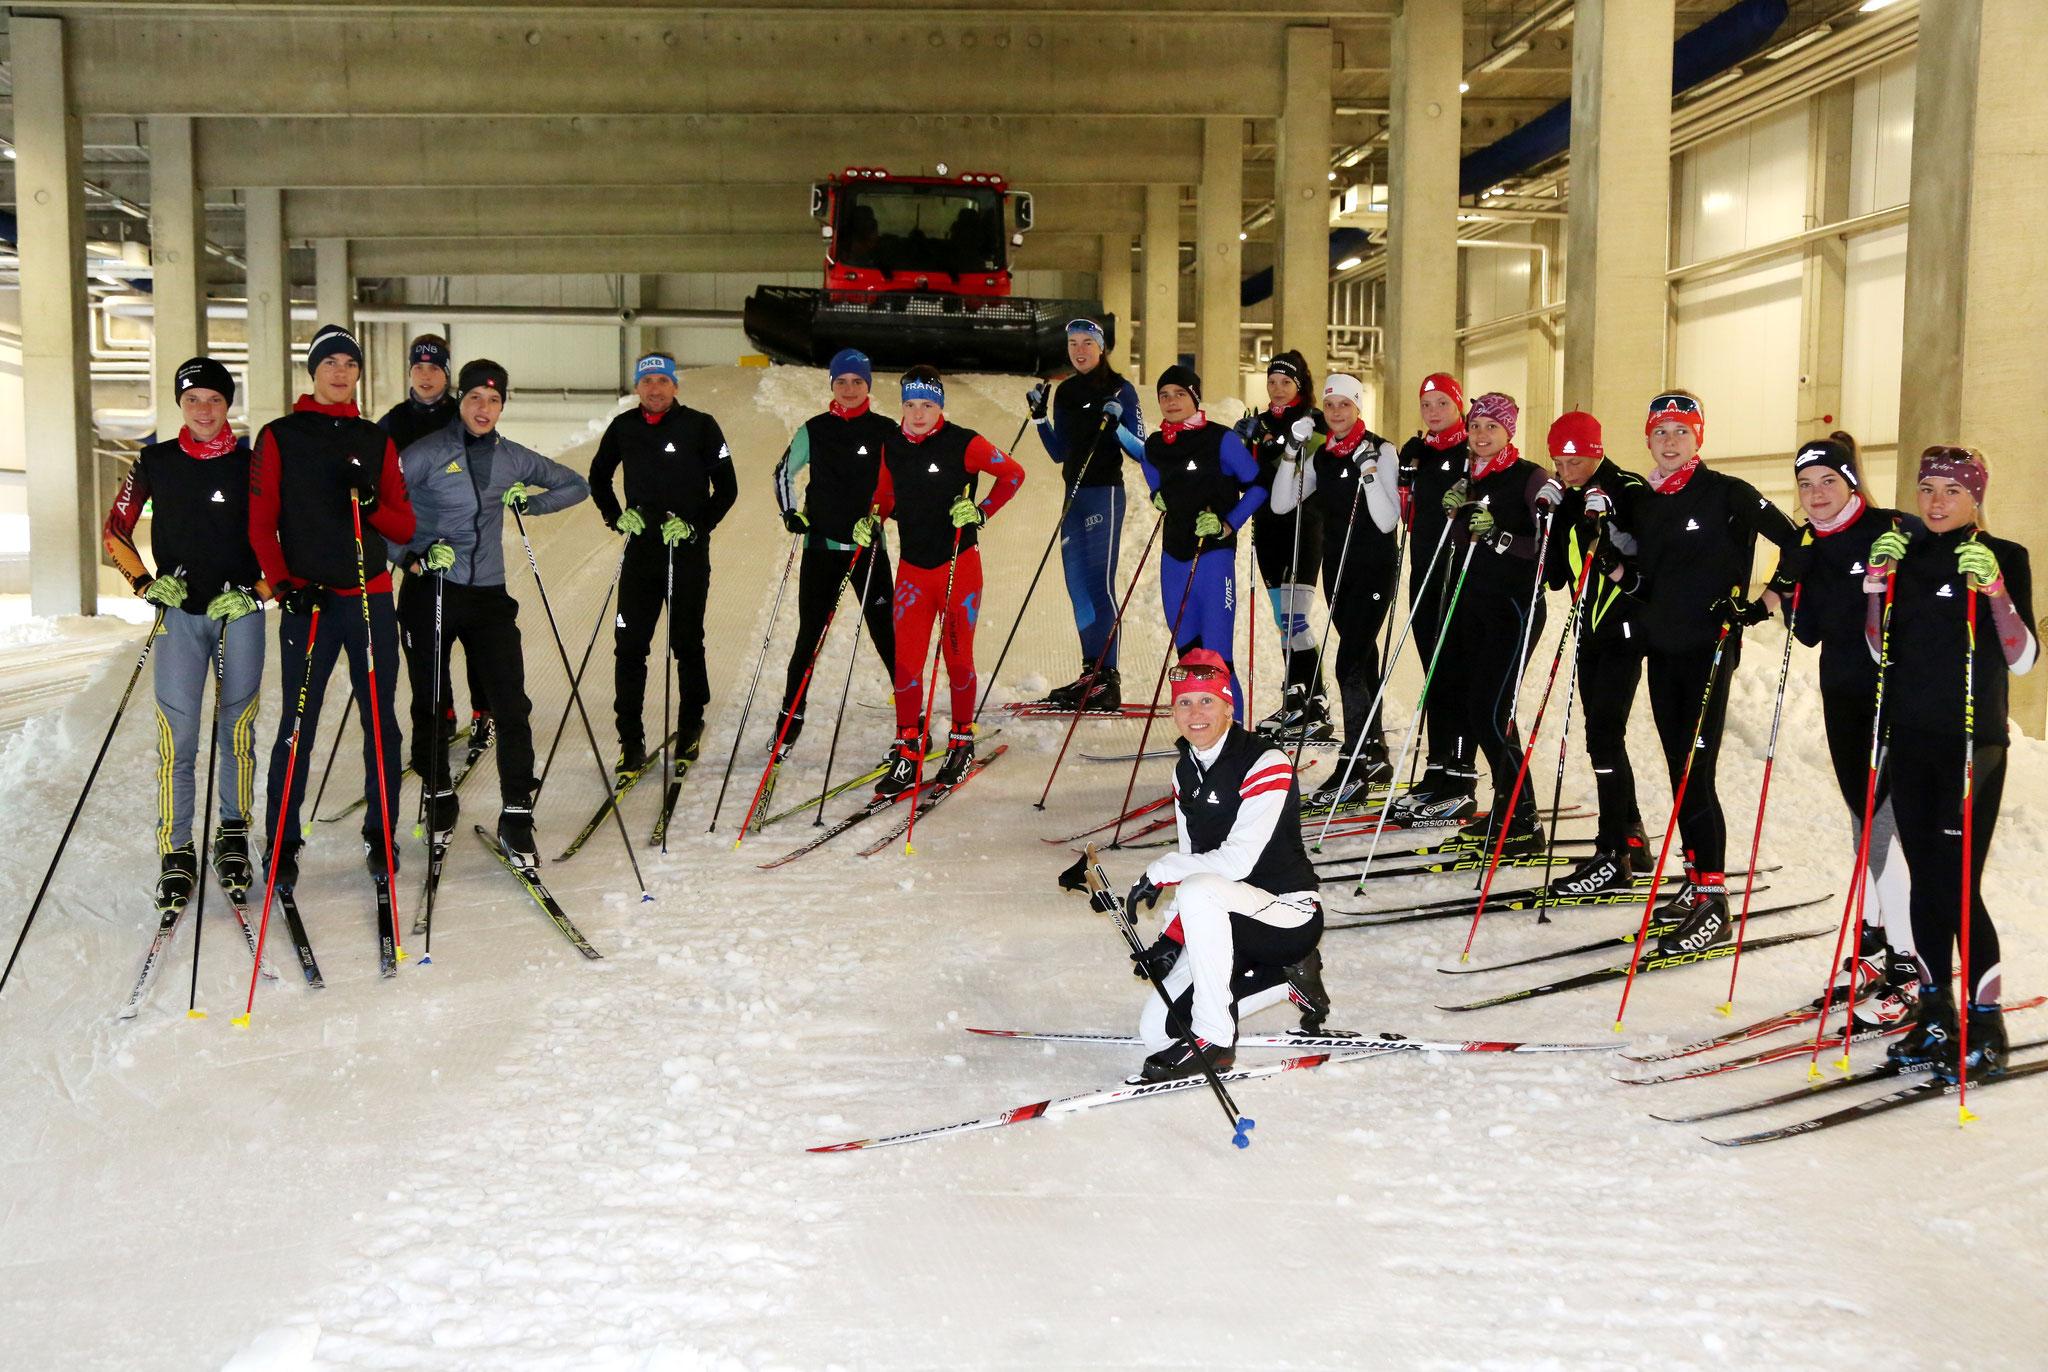 Techniktraining in der Skihalle; Foto: Karina Heßland